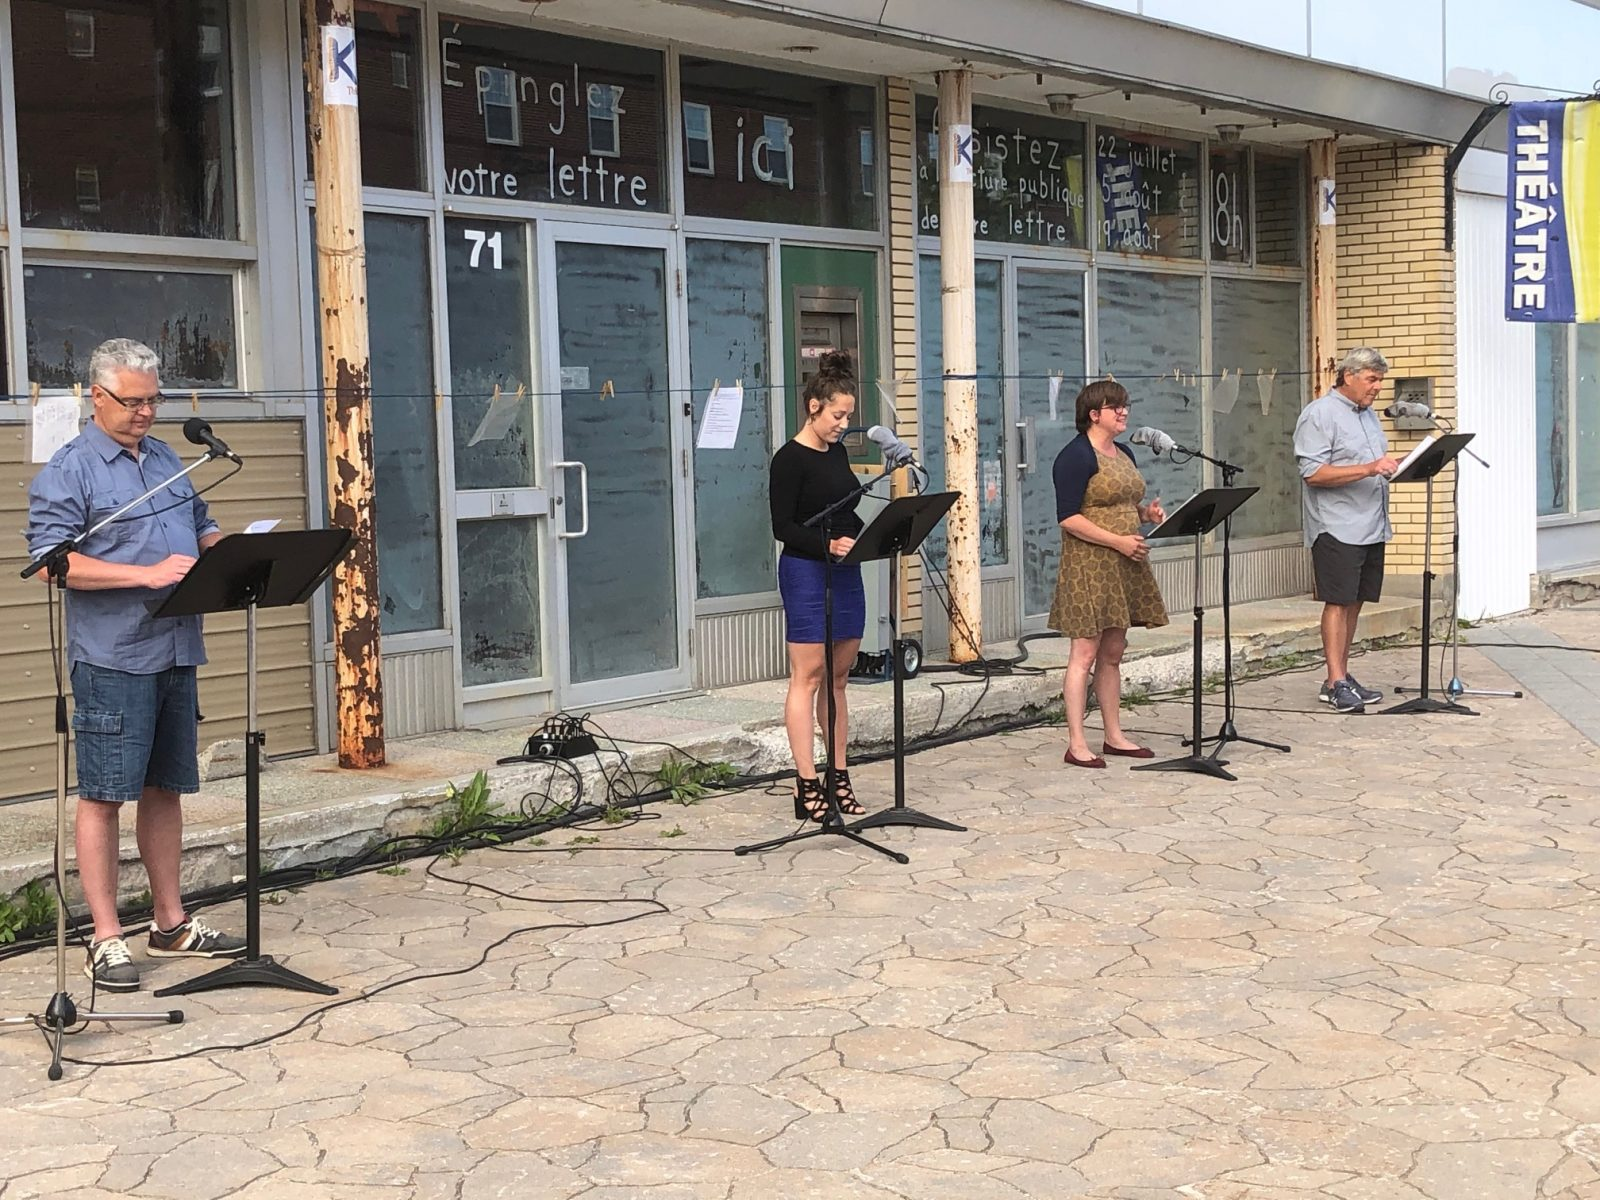 Espace K Théâtre sort la culture en plein air